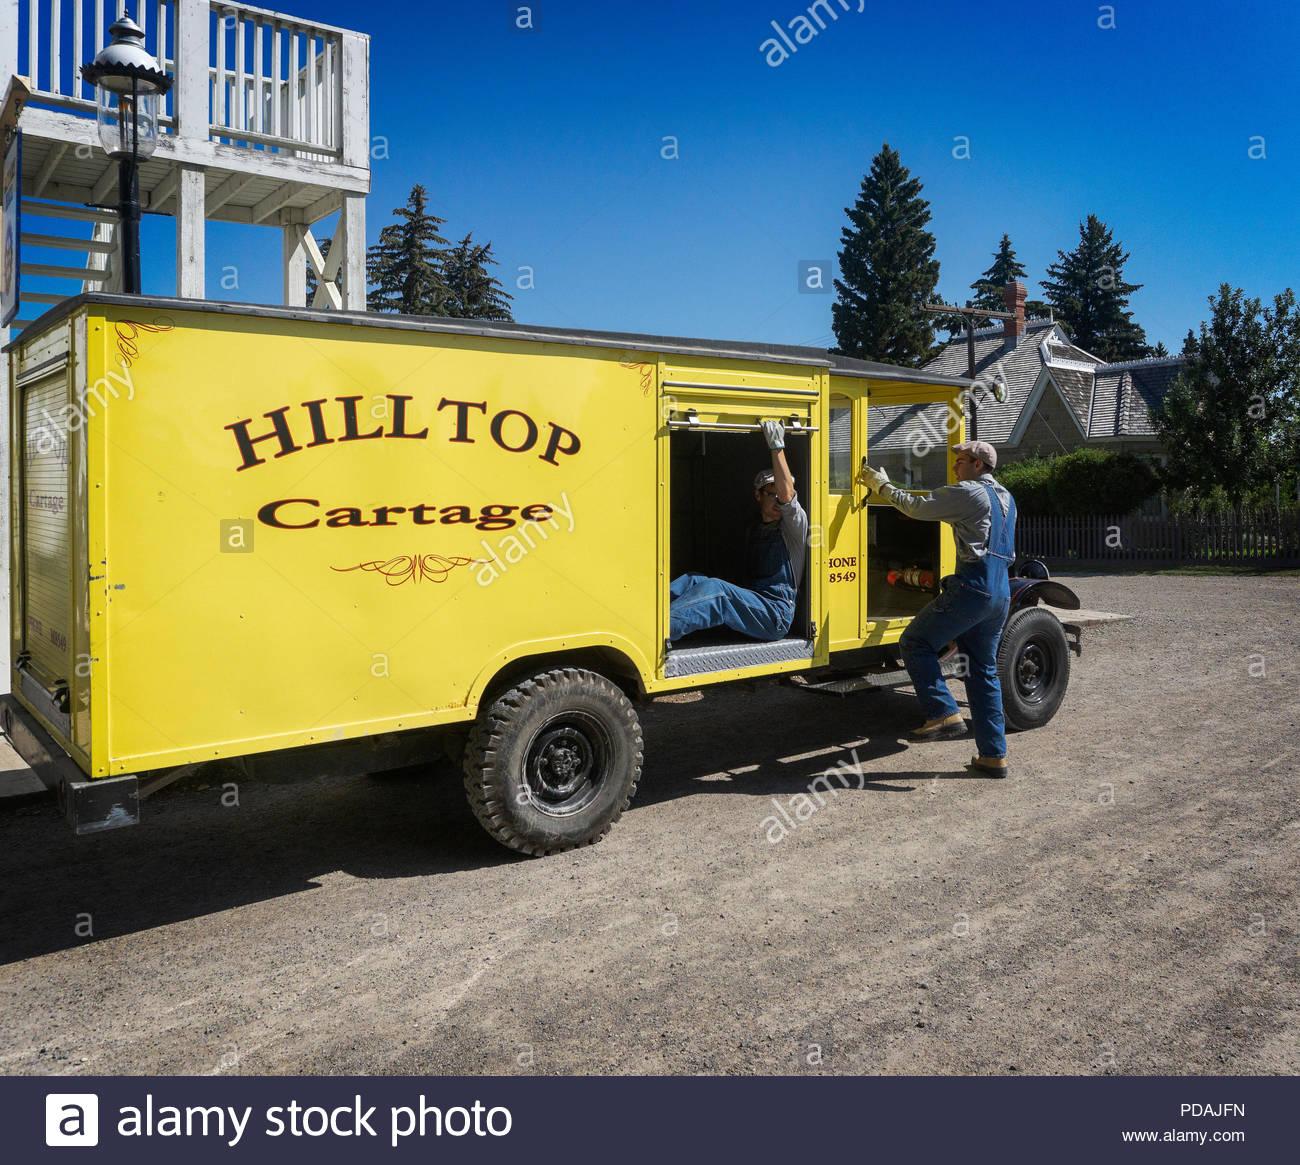 Hilltop Cartage Heritage Park Calgary Alberta Canada - Stock Image